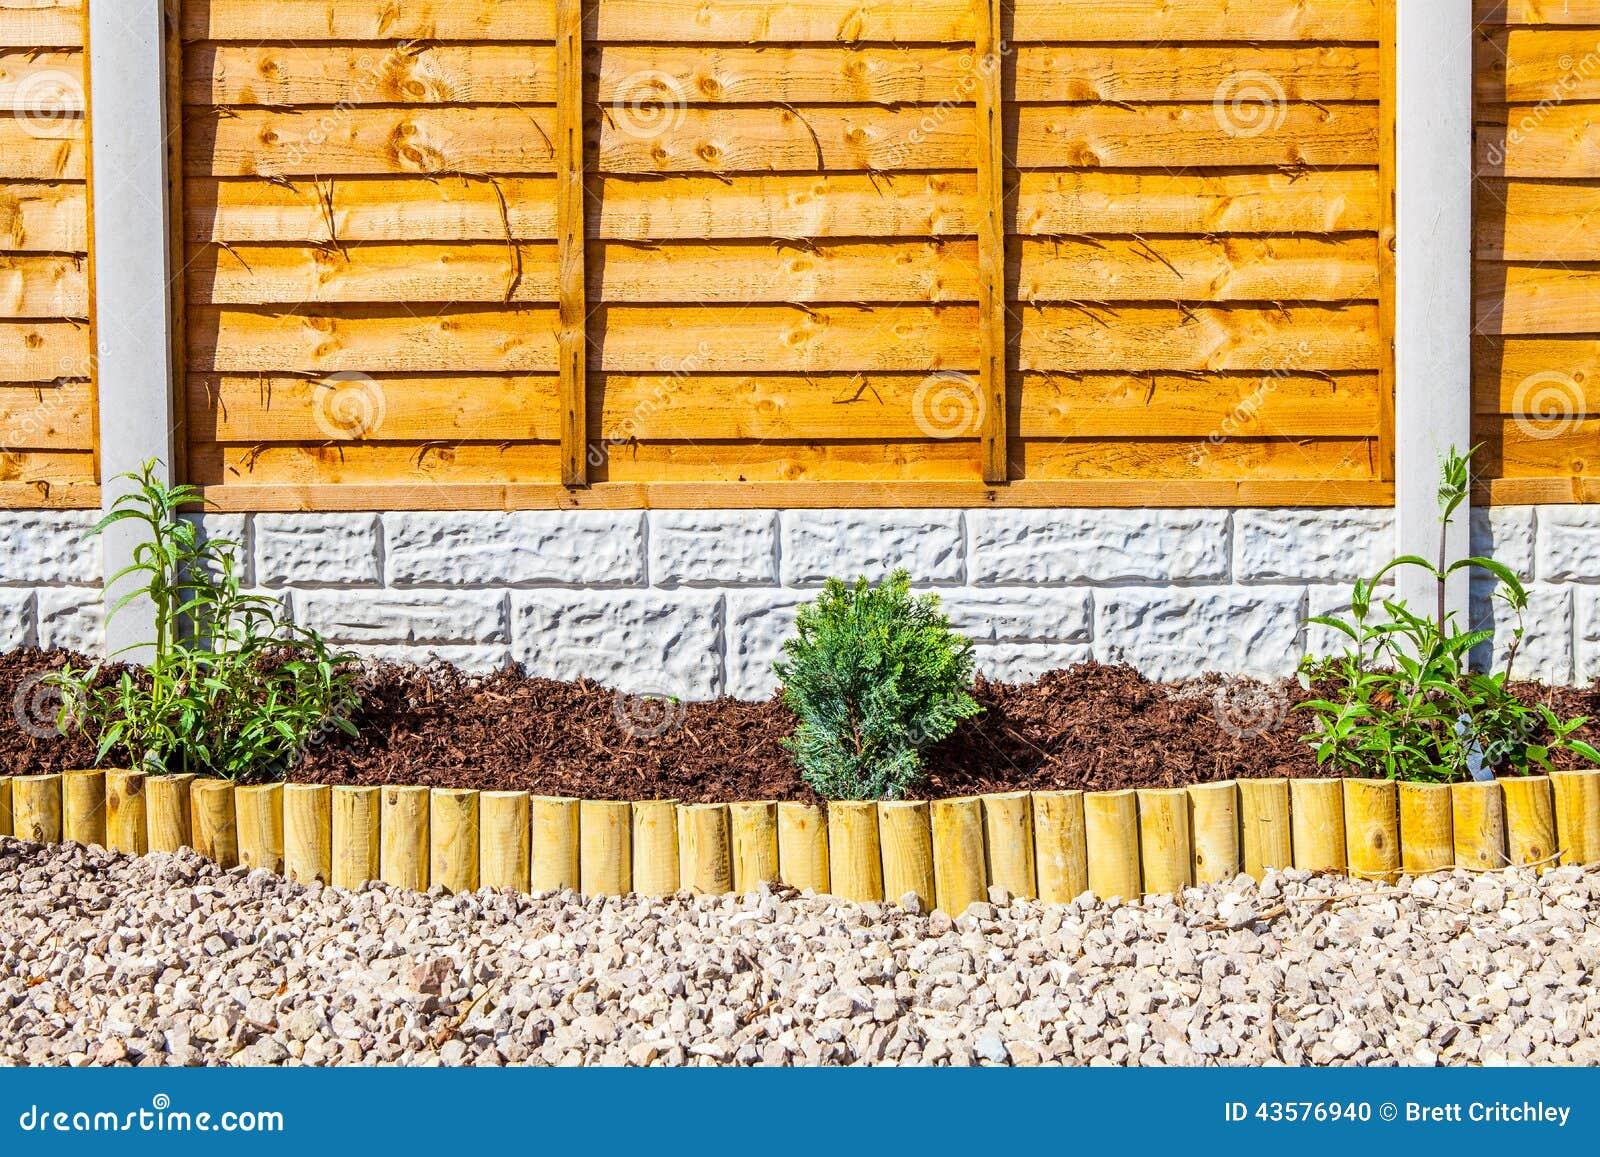 Boards Border Chip Edging Fence Fencing Garden ...